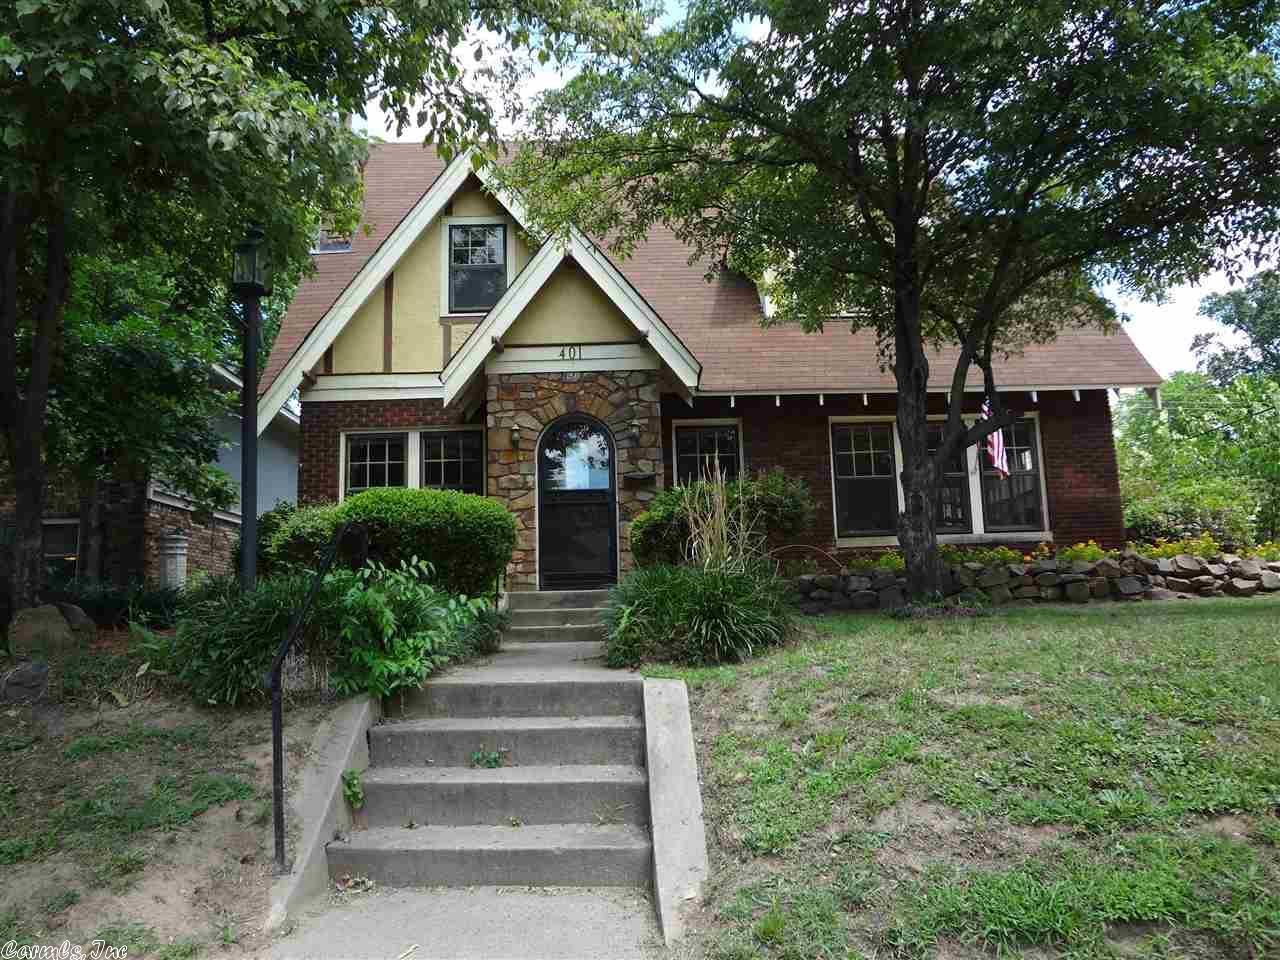 401 W 4th St, North Little Rock, AR 72114 | MLS# 16015855 | Redfin